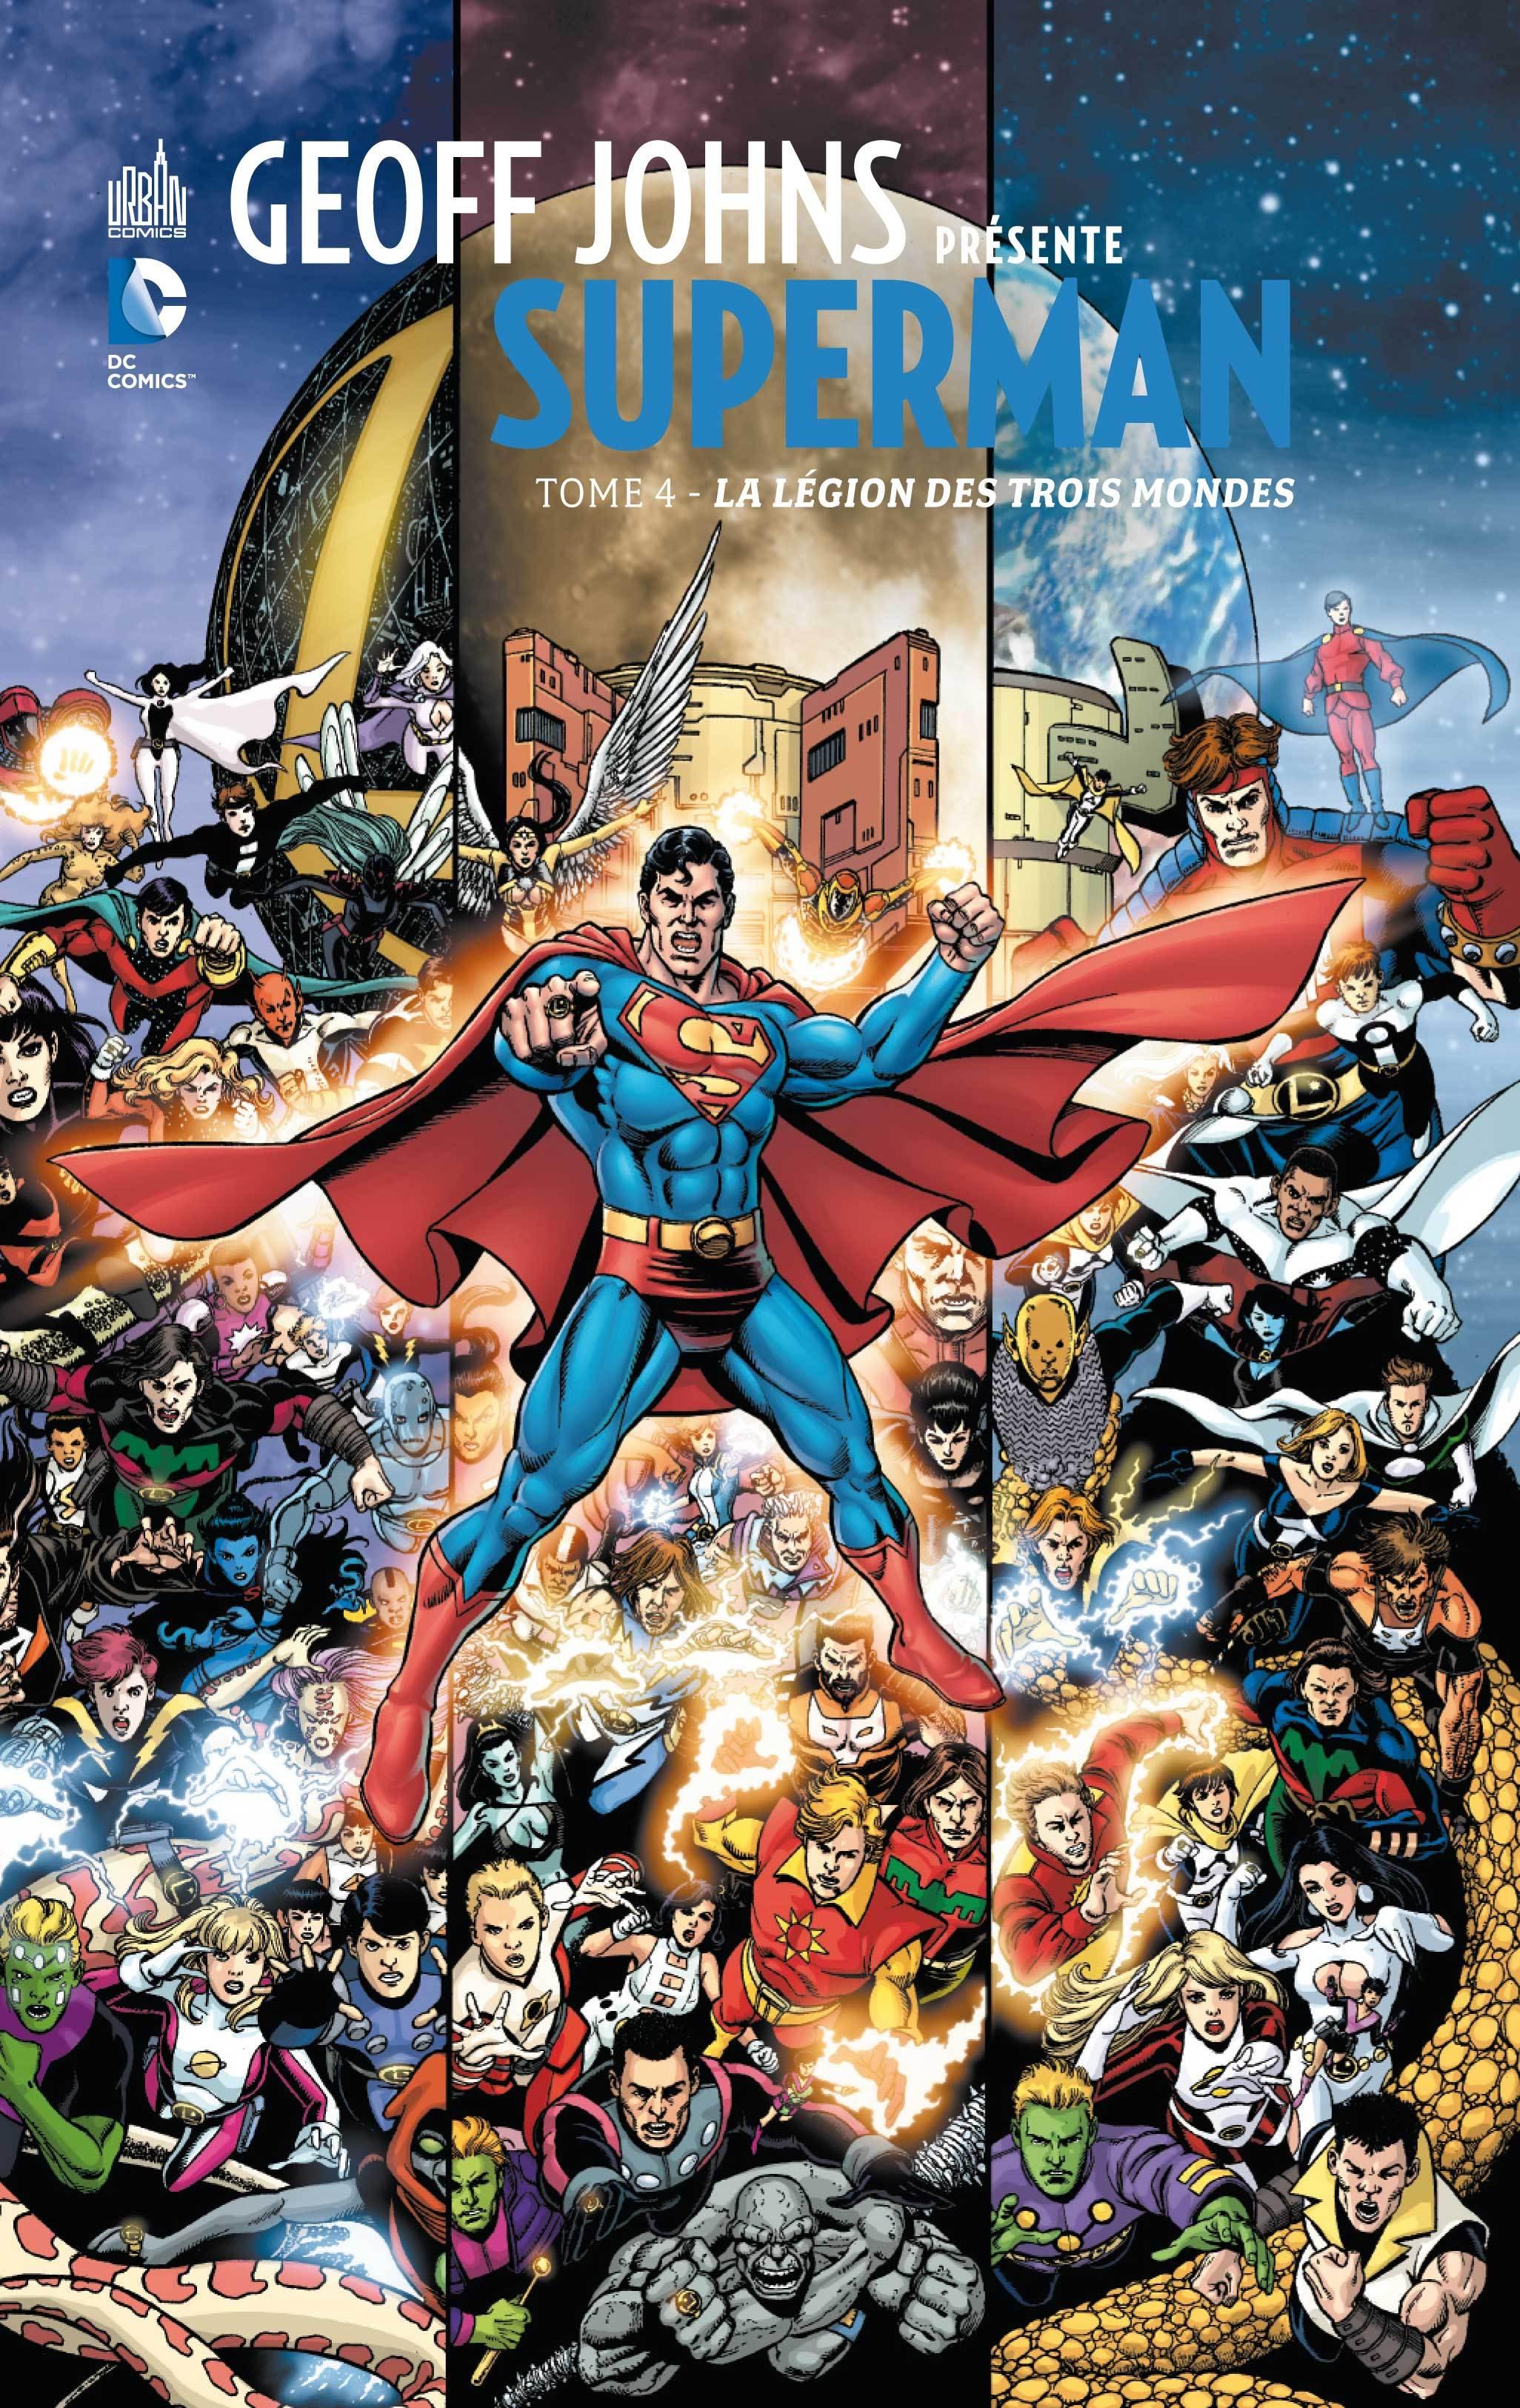 GEOFF JOHNA PRESENTE SUPERMAN T4